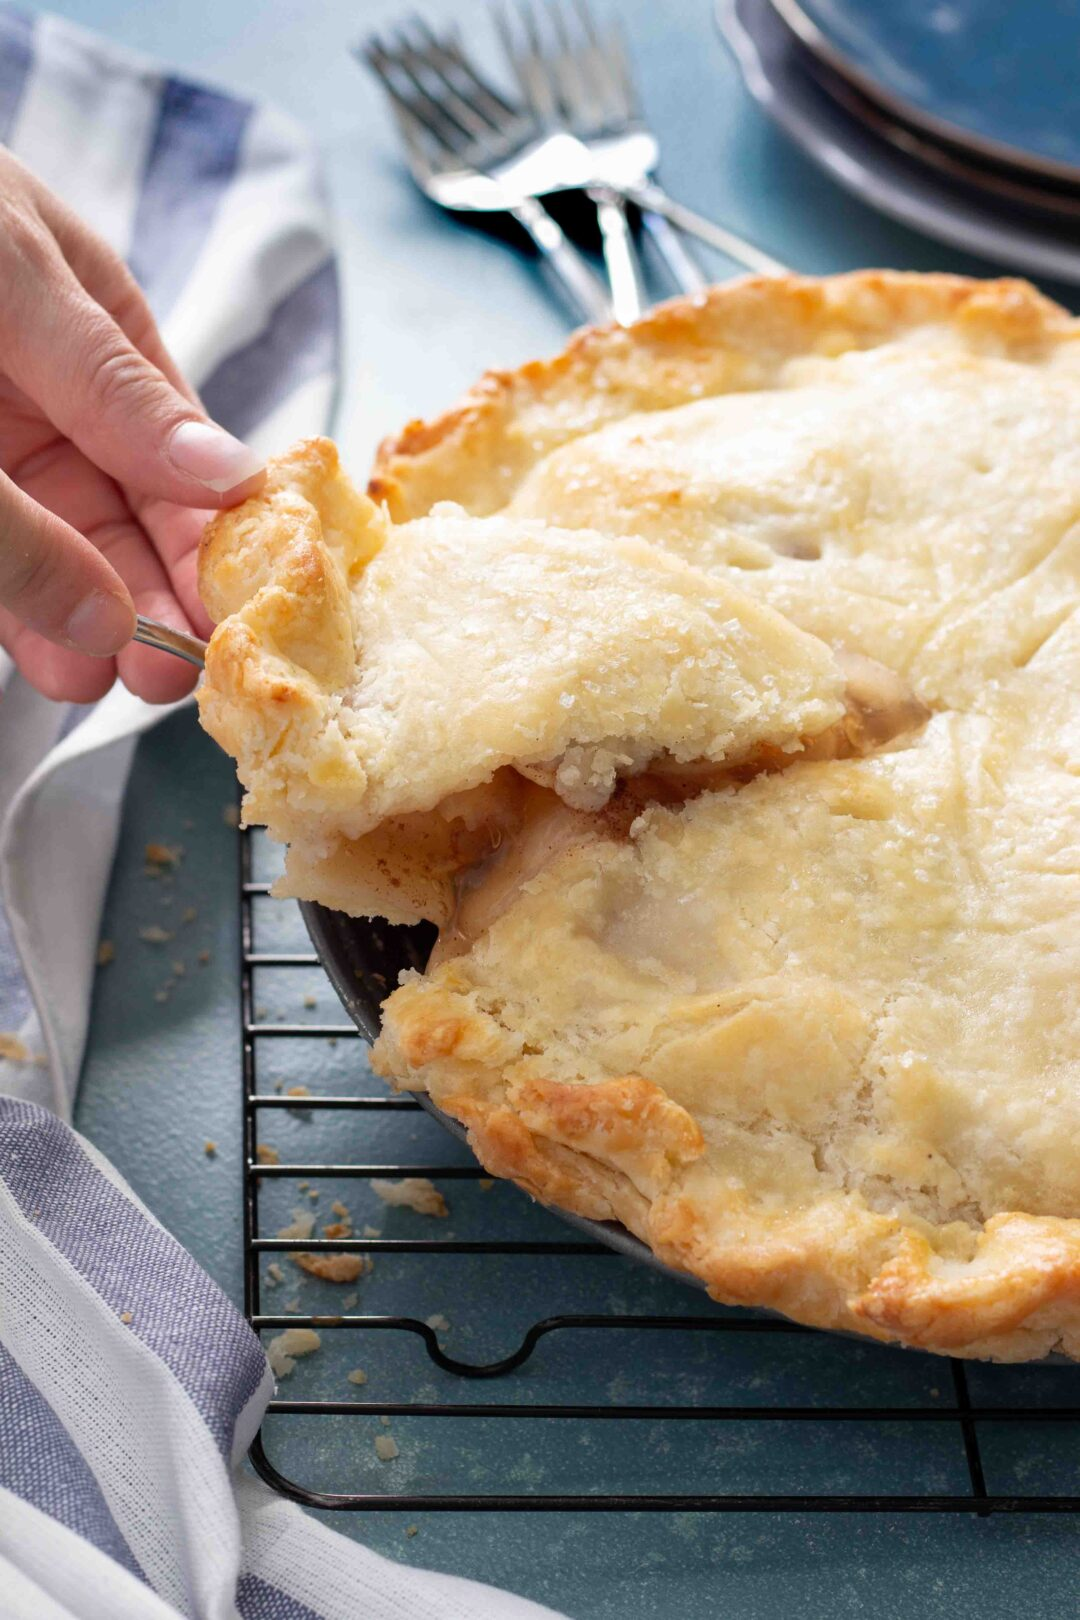 someone serving a slice of gluten free apple pie